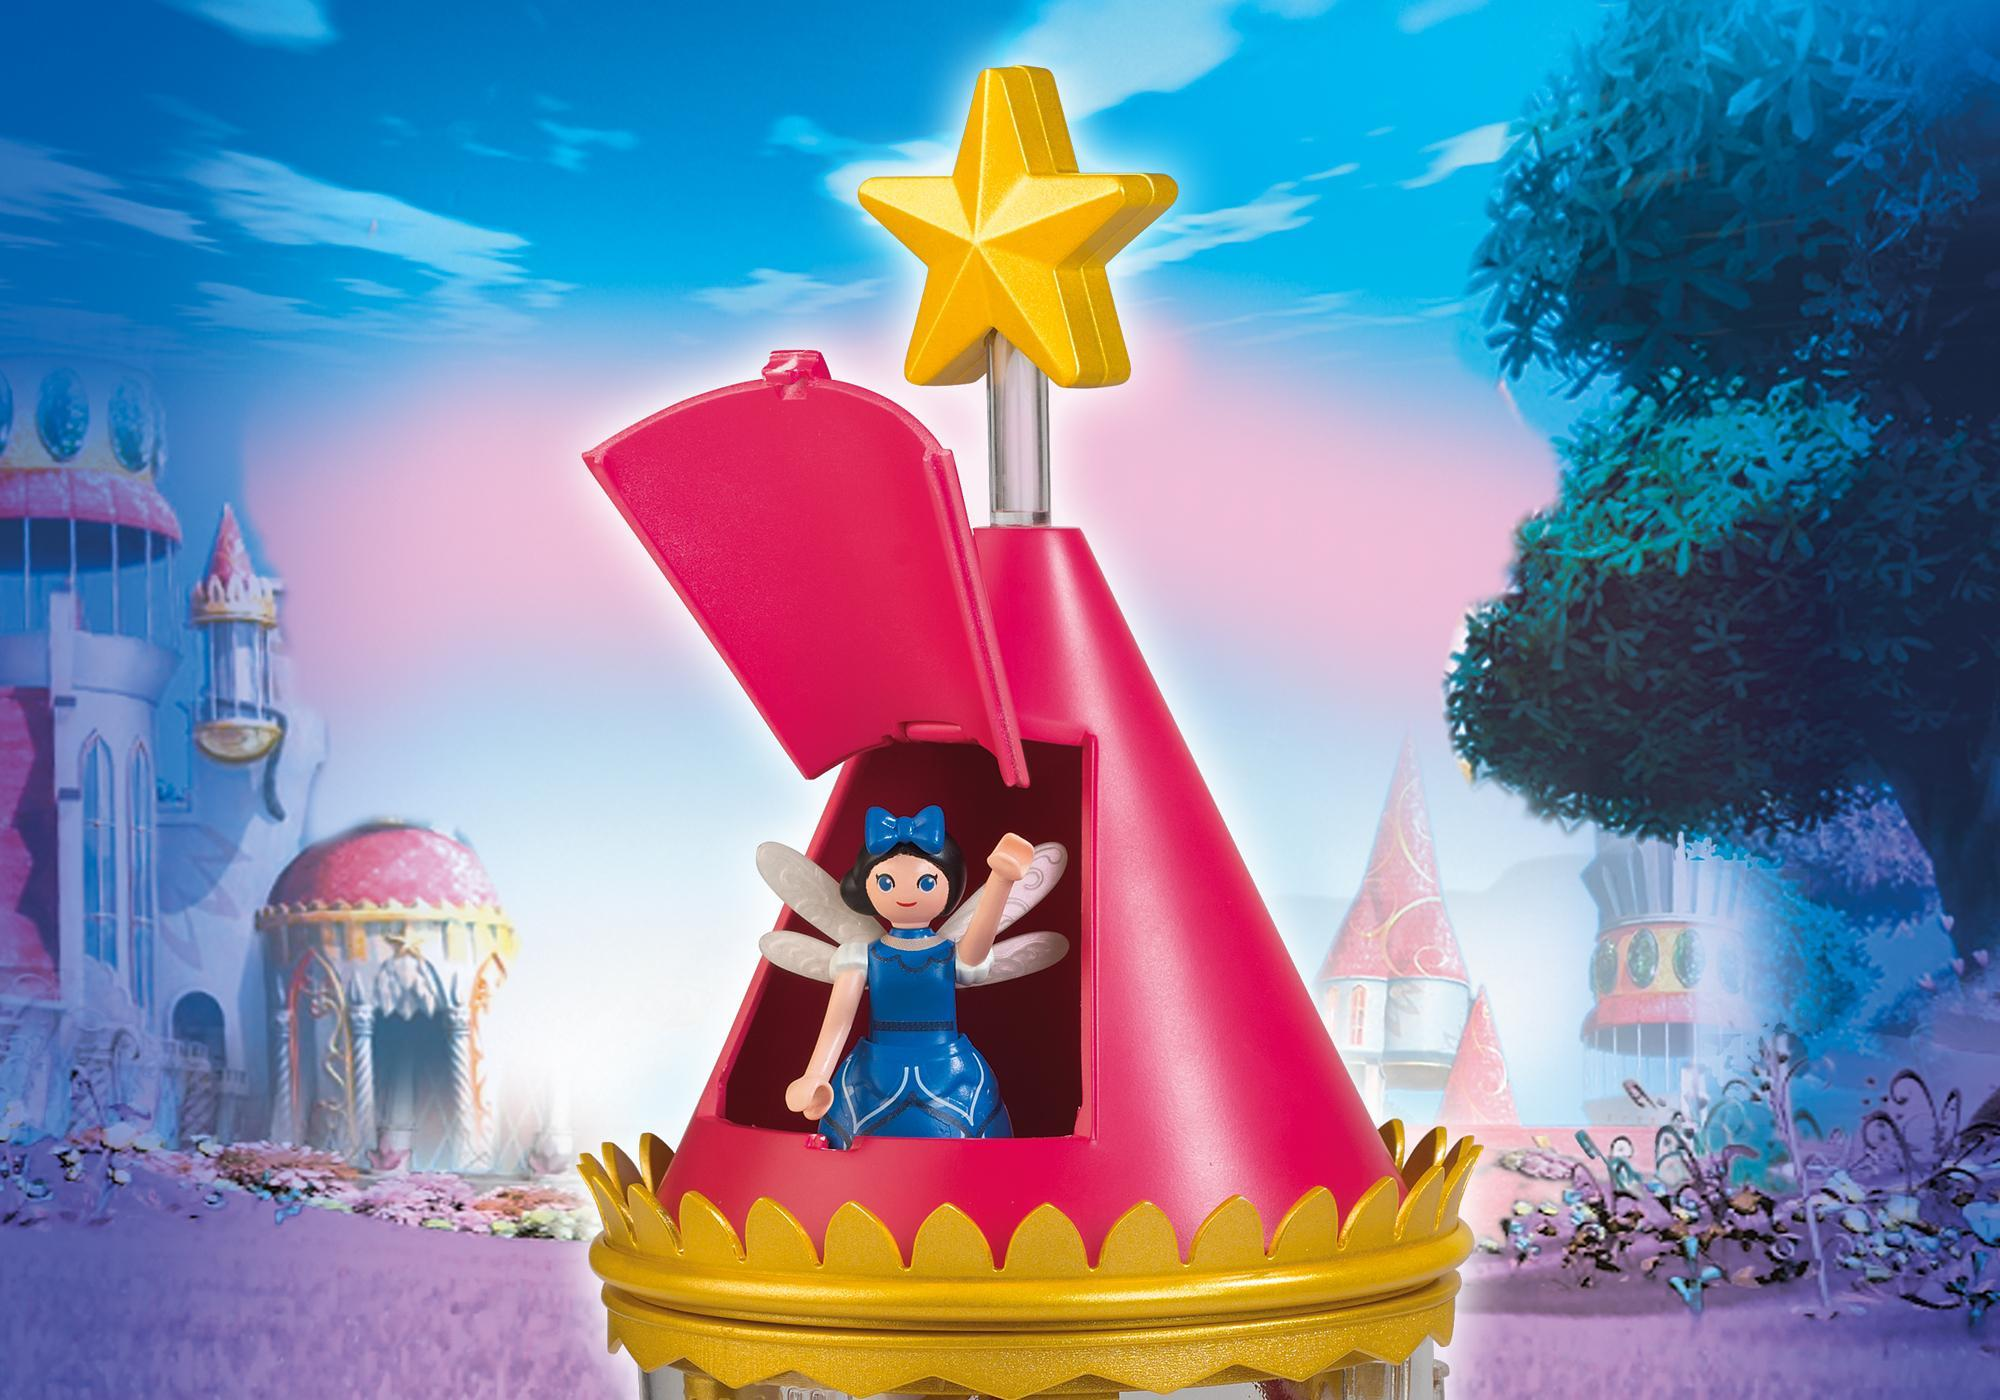 http://media.playmobil.com/i/playmobil/6688_product_extra2/Музыкальные Цветочная Башня с Твинкл